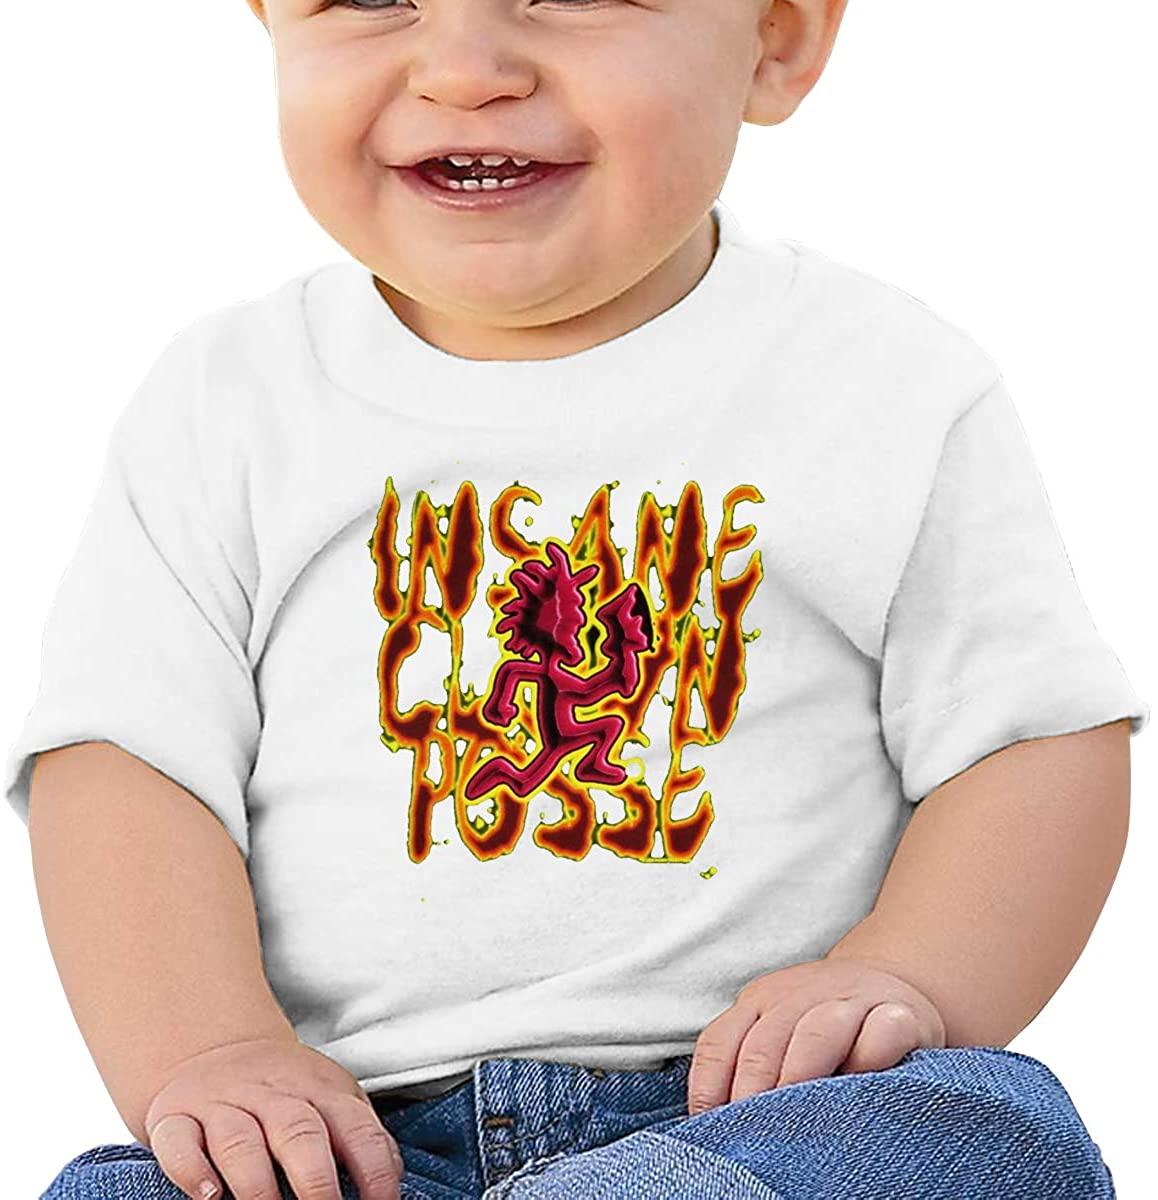 6-24 Months Boy and Girl Baby Short Sleeve T-Shirt Hatchetman ICP Original Minimalist Style White